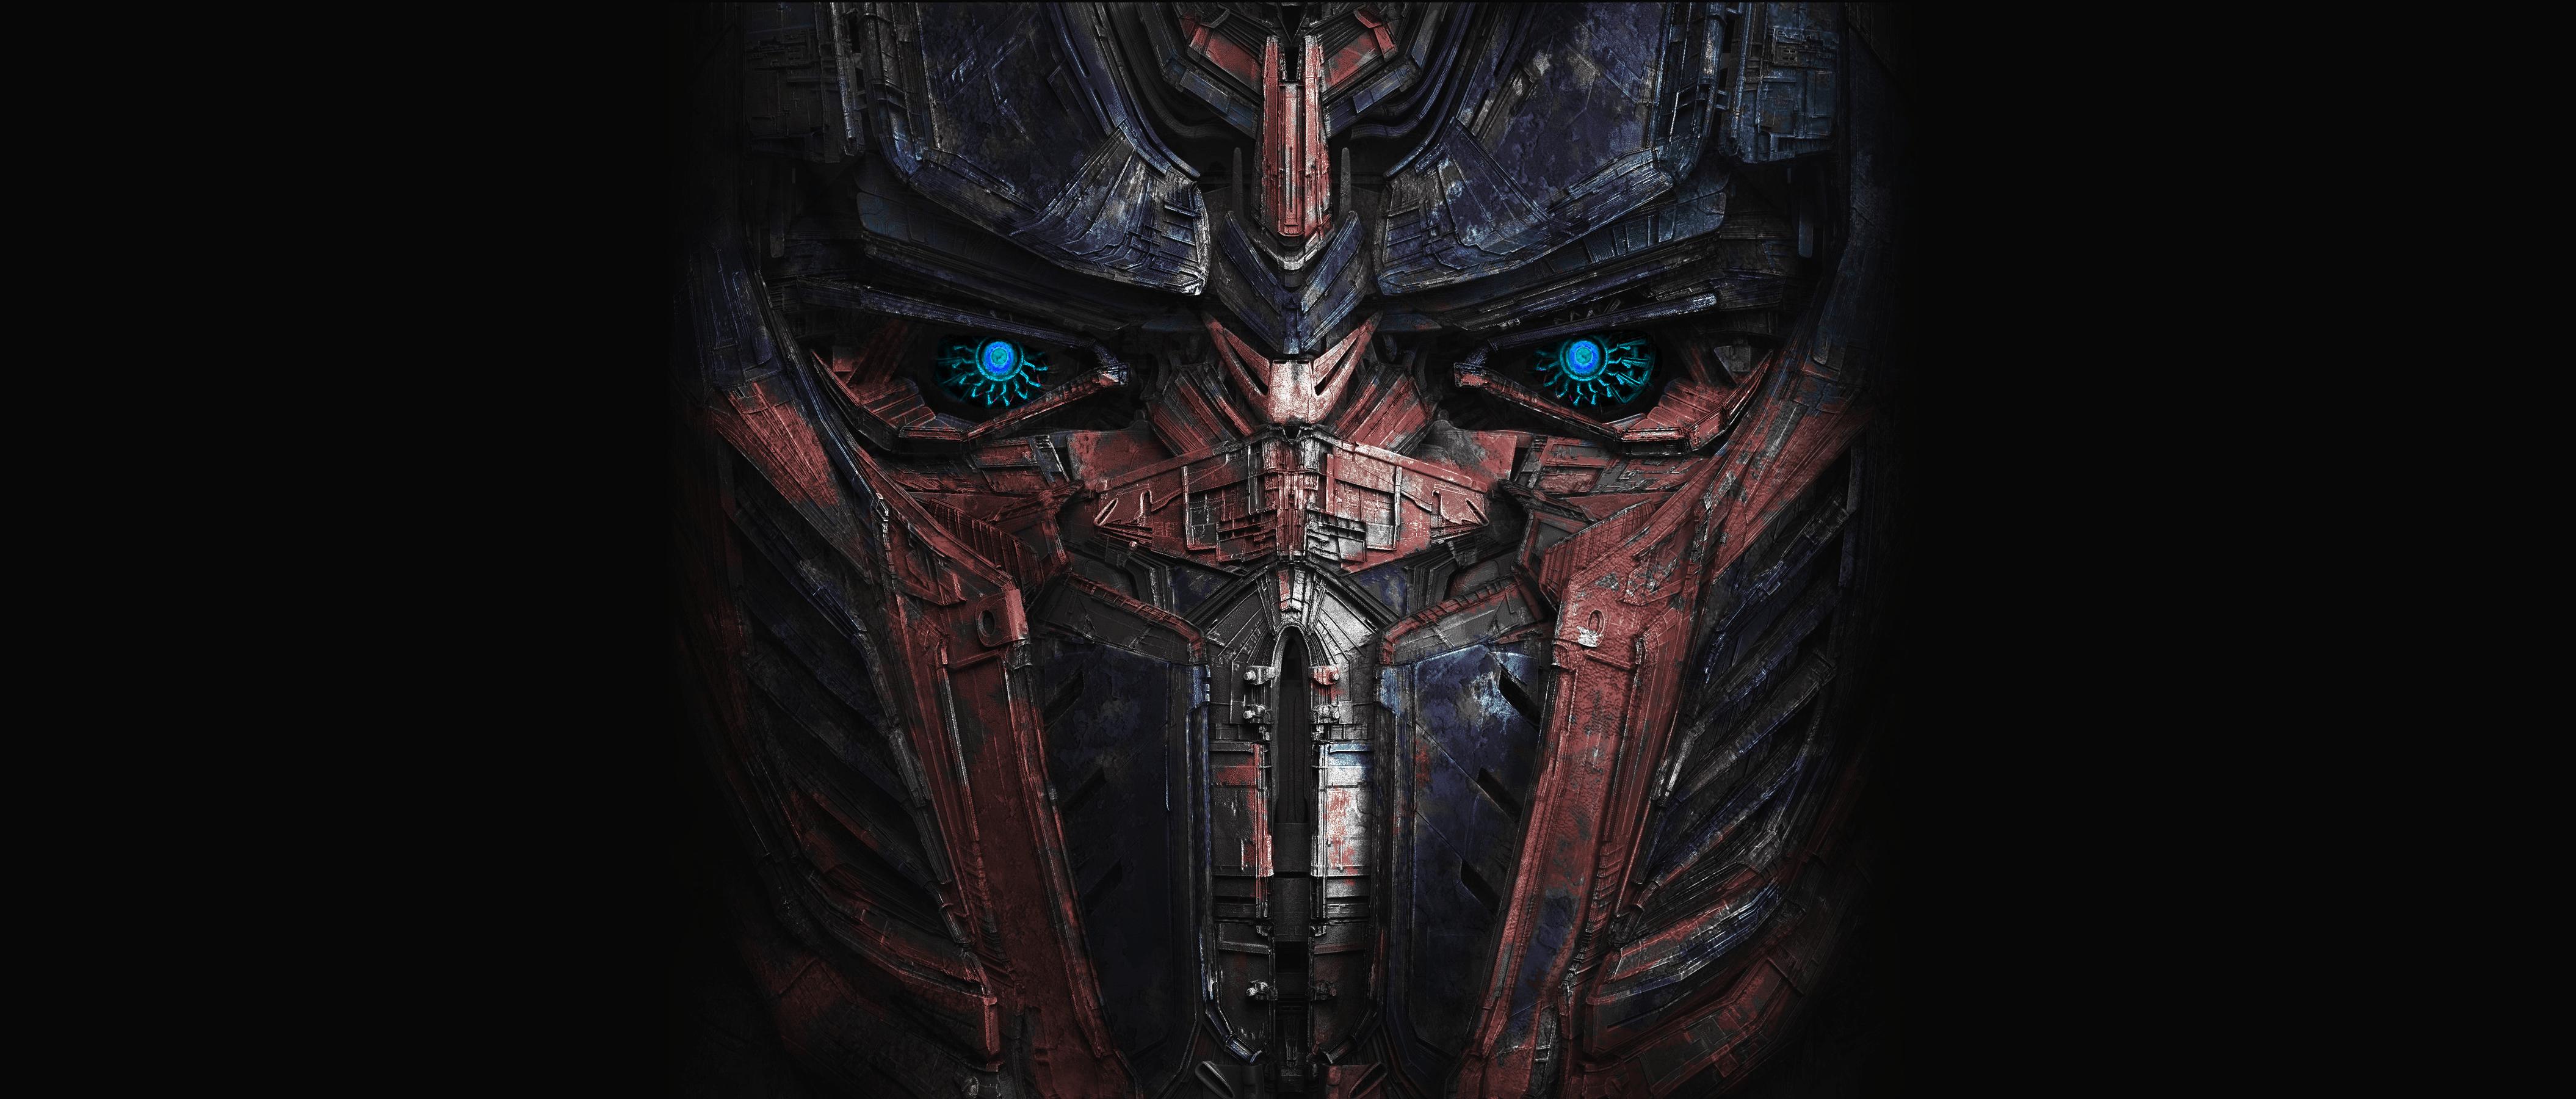 Transformers 5 Hd Wallpapers 1080p Download Optimus Prime Face Wallpapers 46 Wallpapers Hd Wallpapers